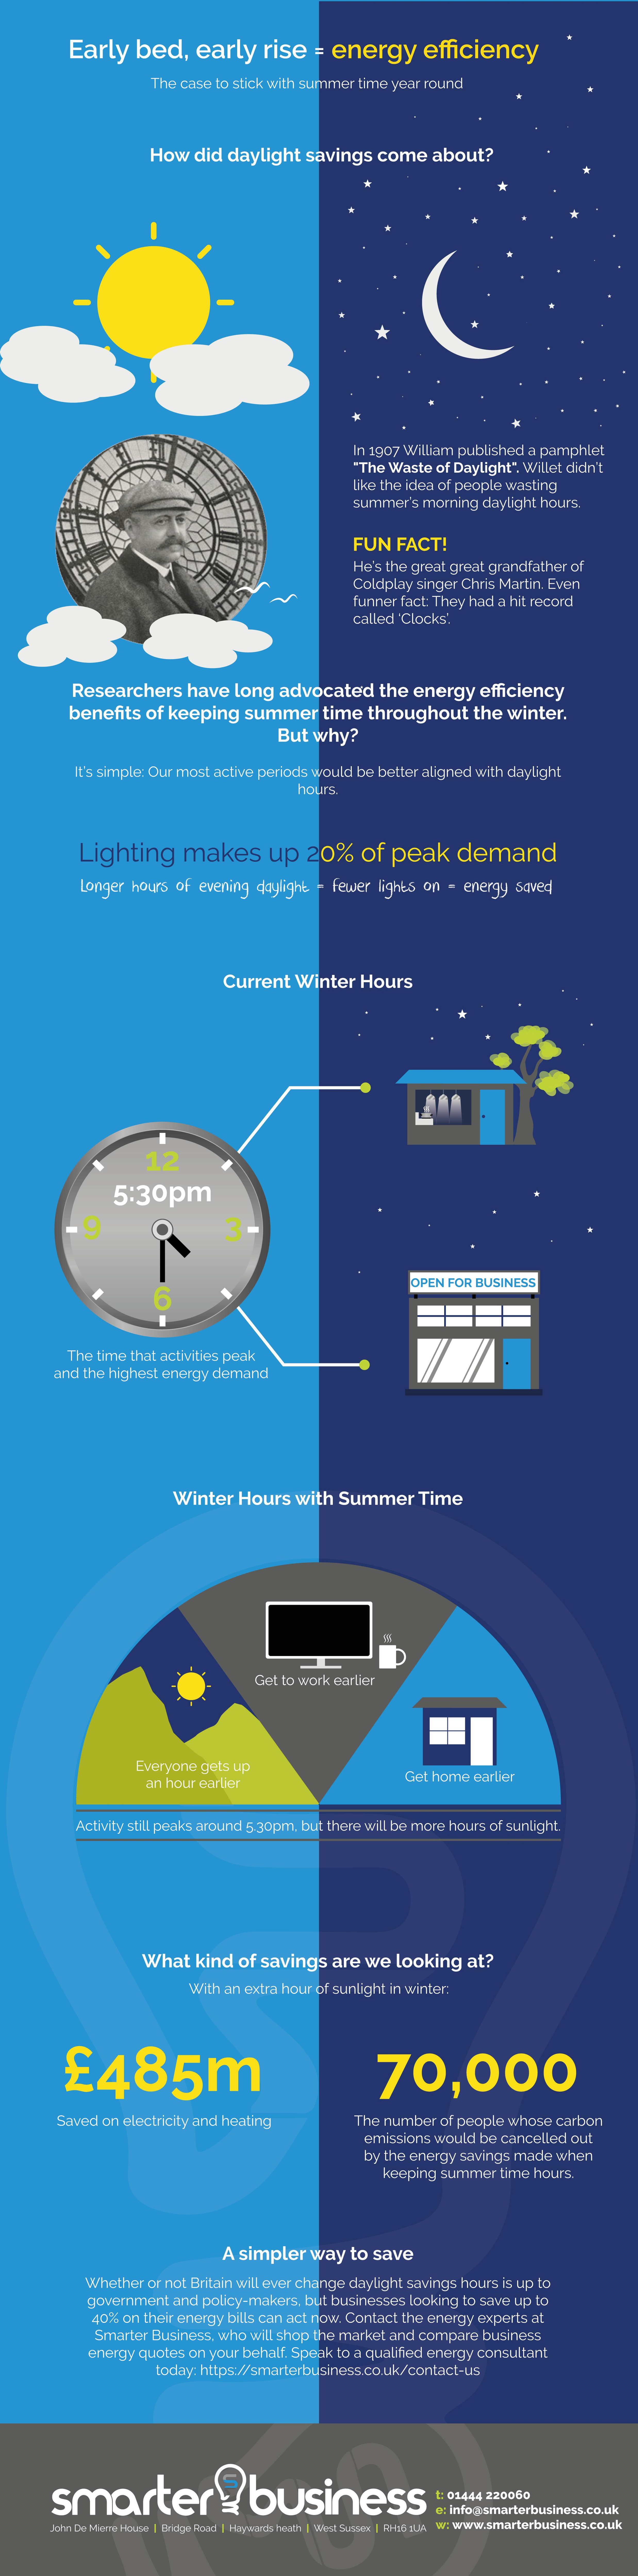 Daylight Savings Energy Efficiency - INFOGRAPHIC